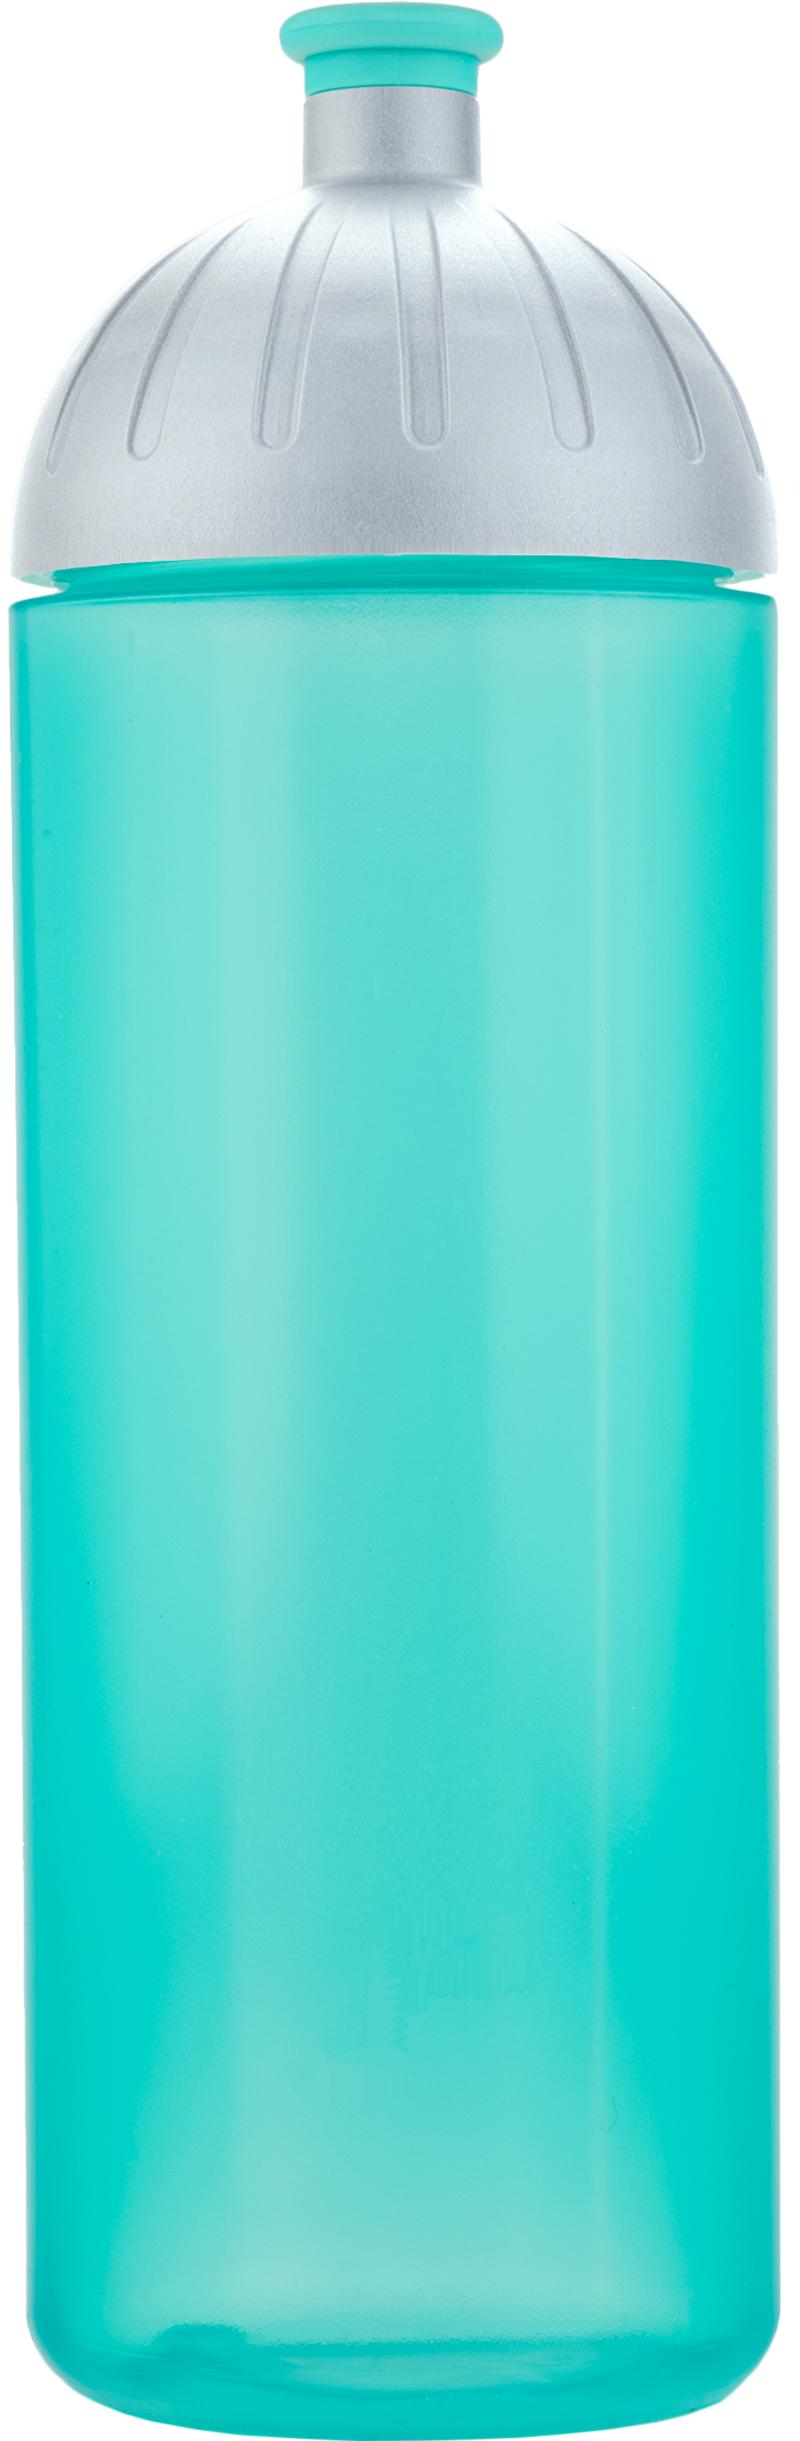 FreeWater lahev 0,7l AQUA+víčko stříbrné